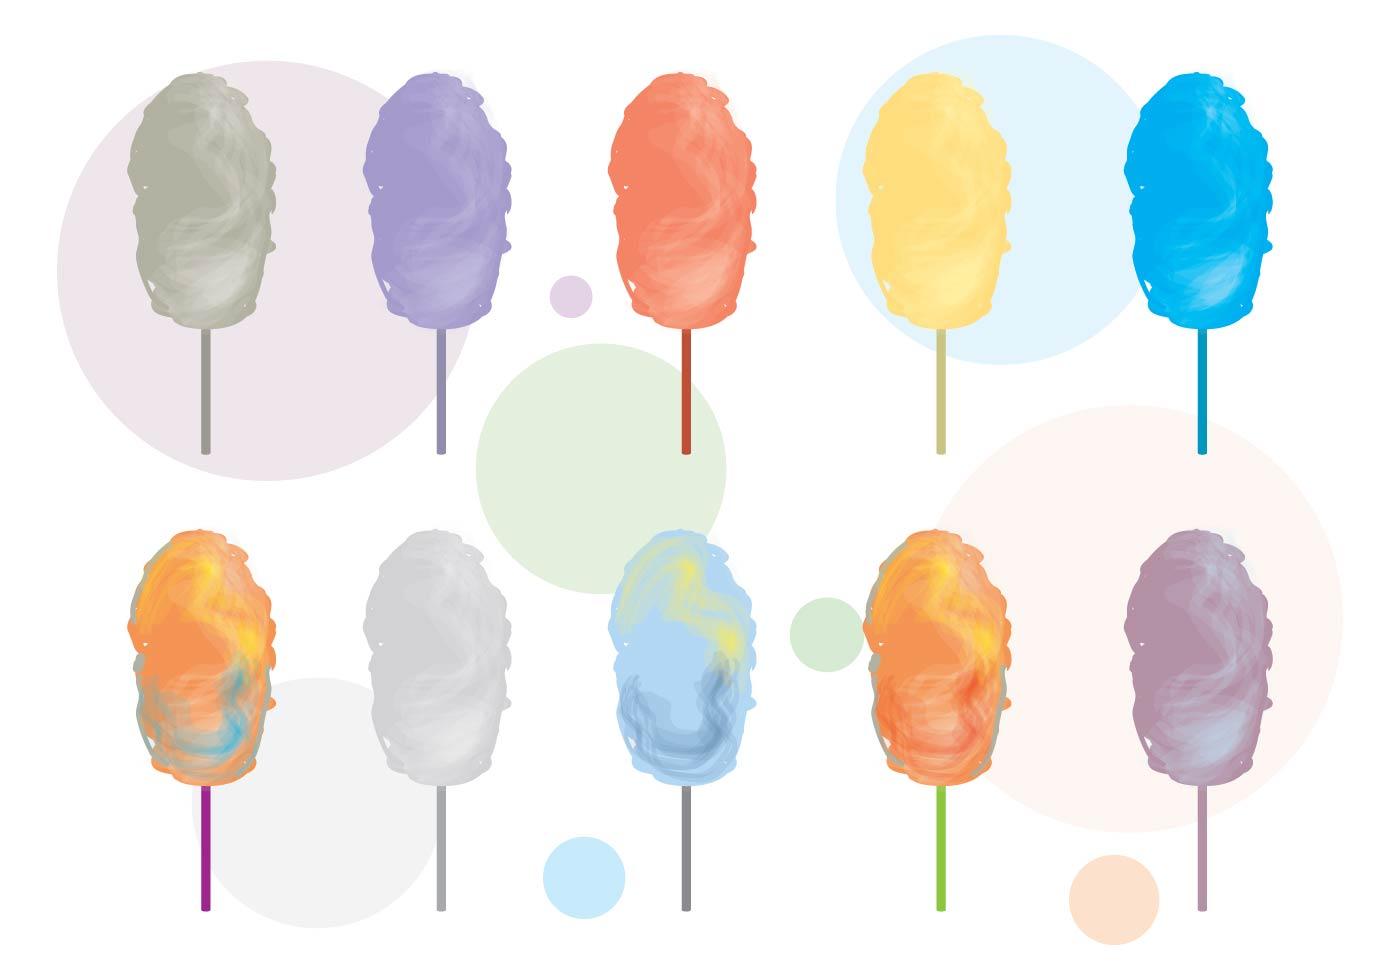 Candy Floss Vector Variant - Download Free Vectors ...